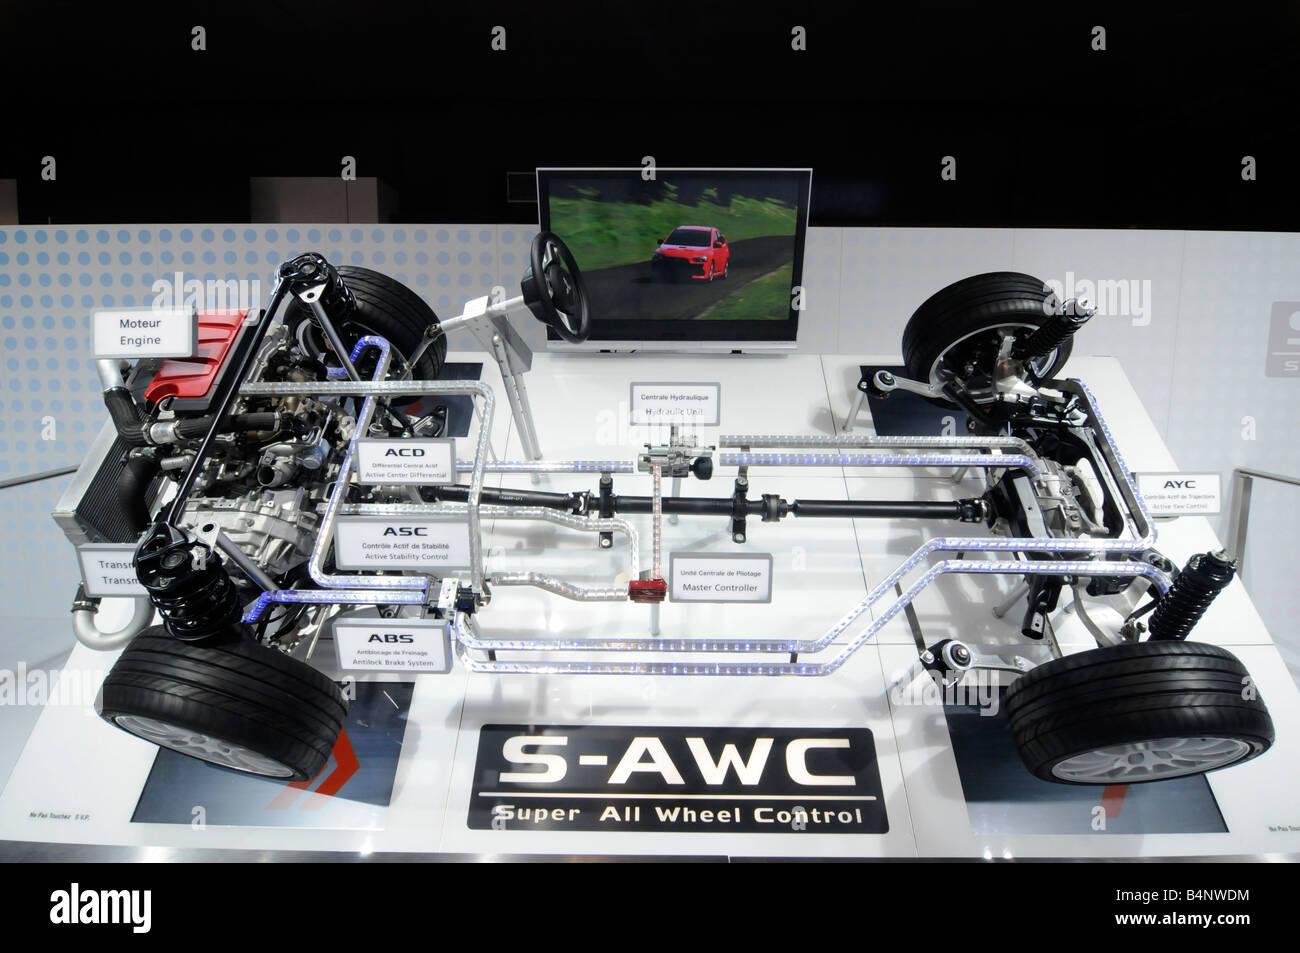 Skeleton Inside Of Car Detailing The Engine And Transmission System Stock Photo Alamy